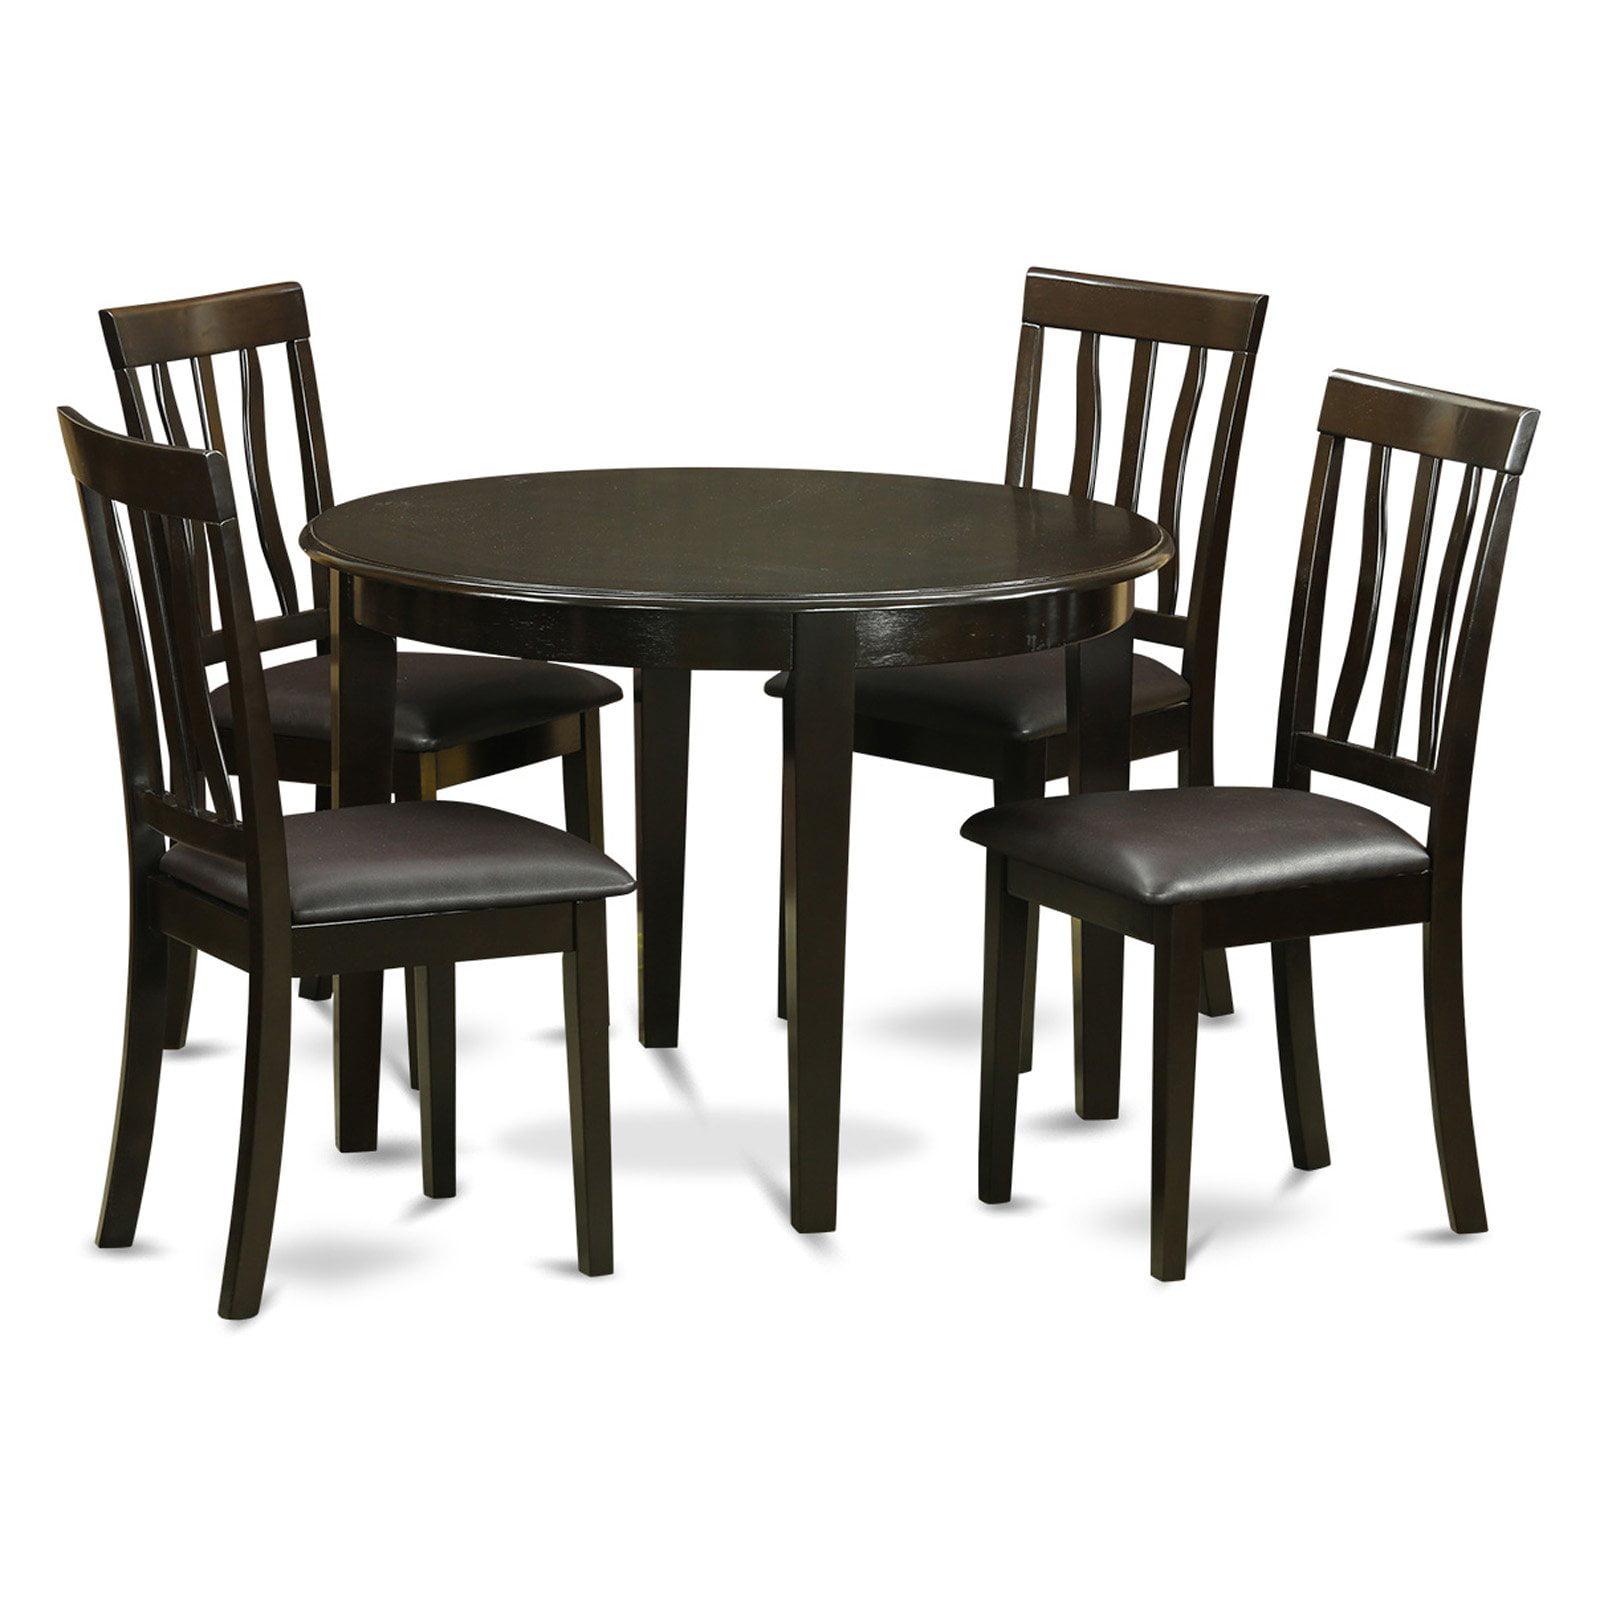 East West Furniture Boston 5 Piece Splat Back Dining Table Set